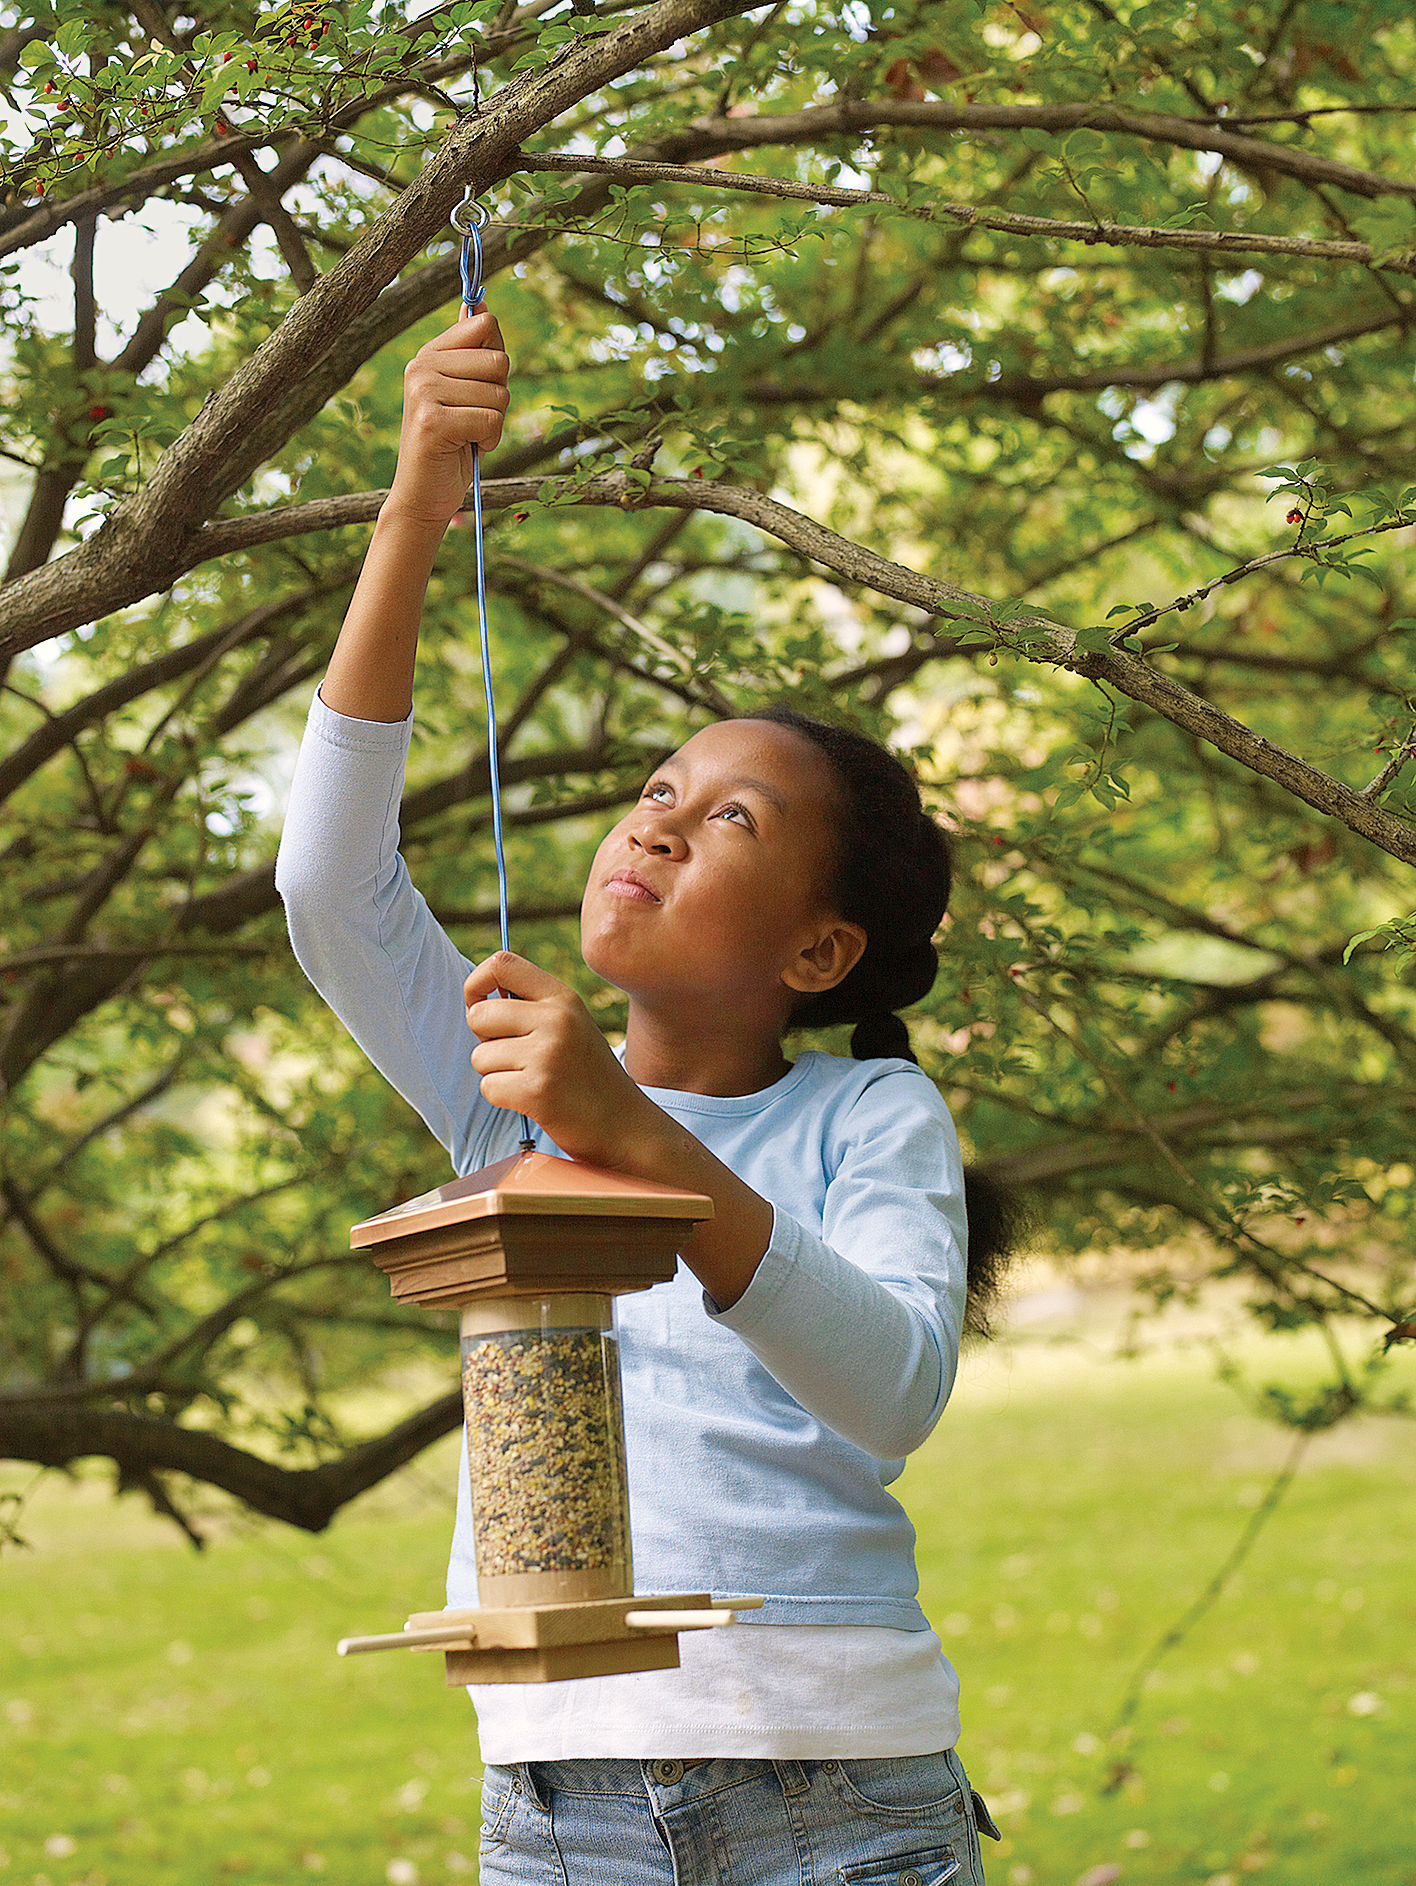 Kid handing up a DIY bird feeder.